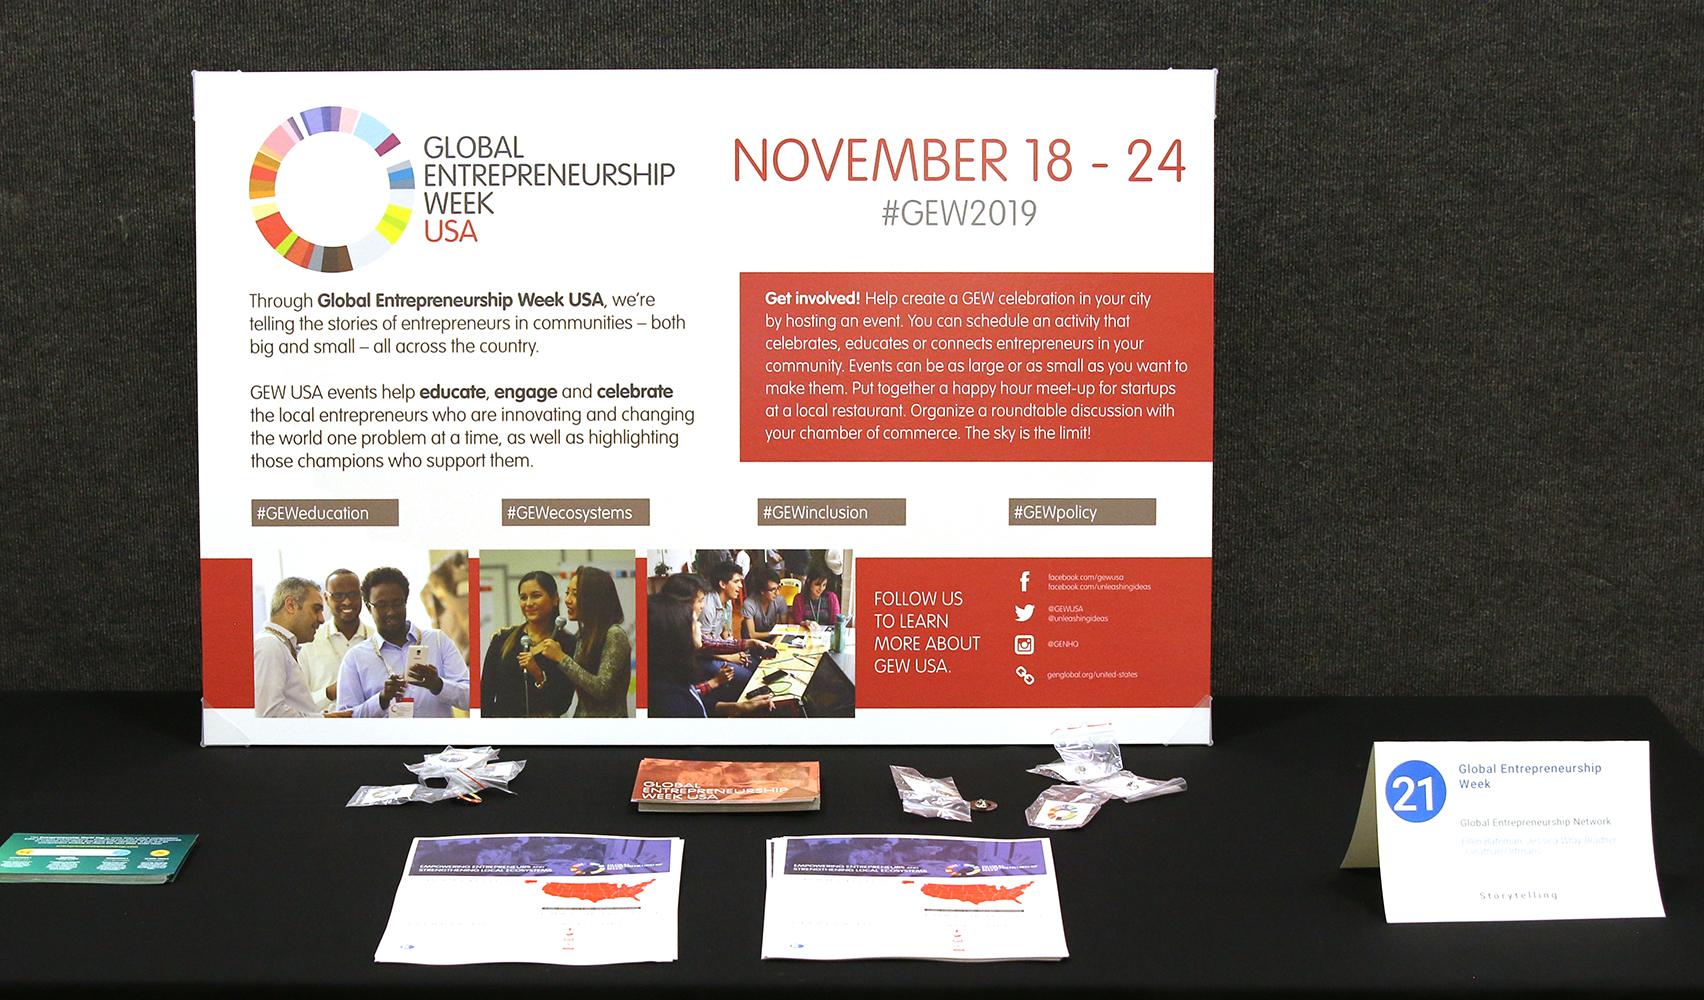 Global Entrepreneurship Week, Science Fair | ESHIP Summit 2019